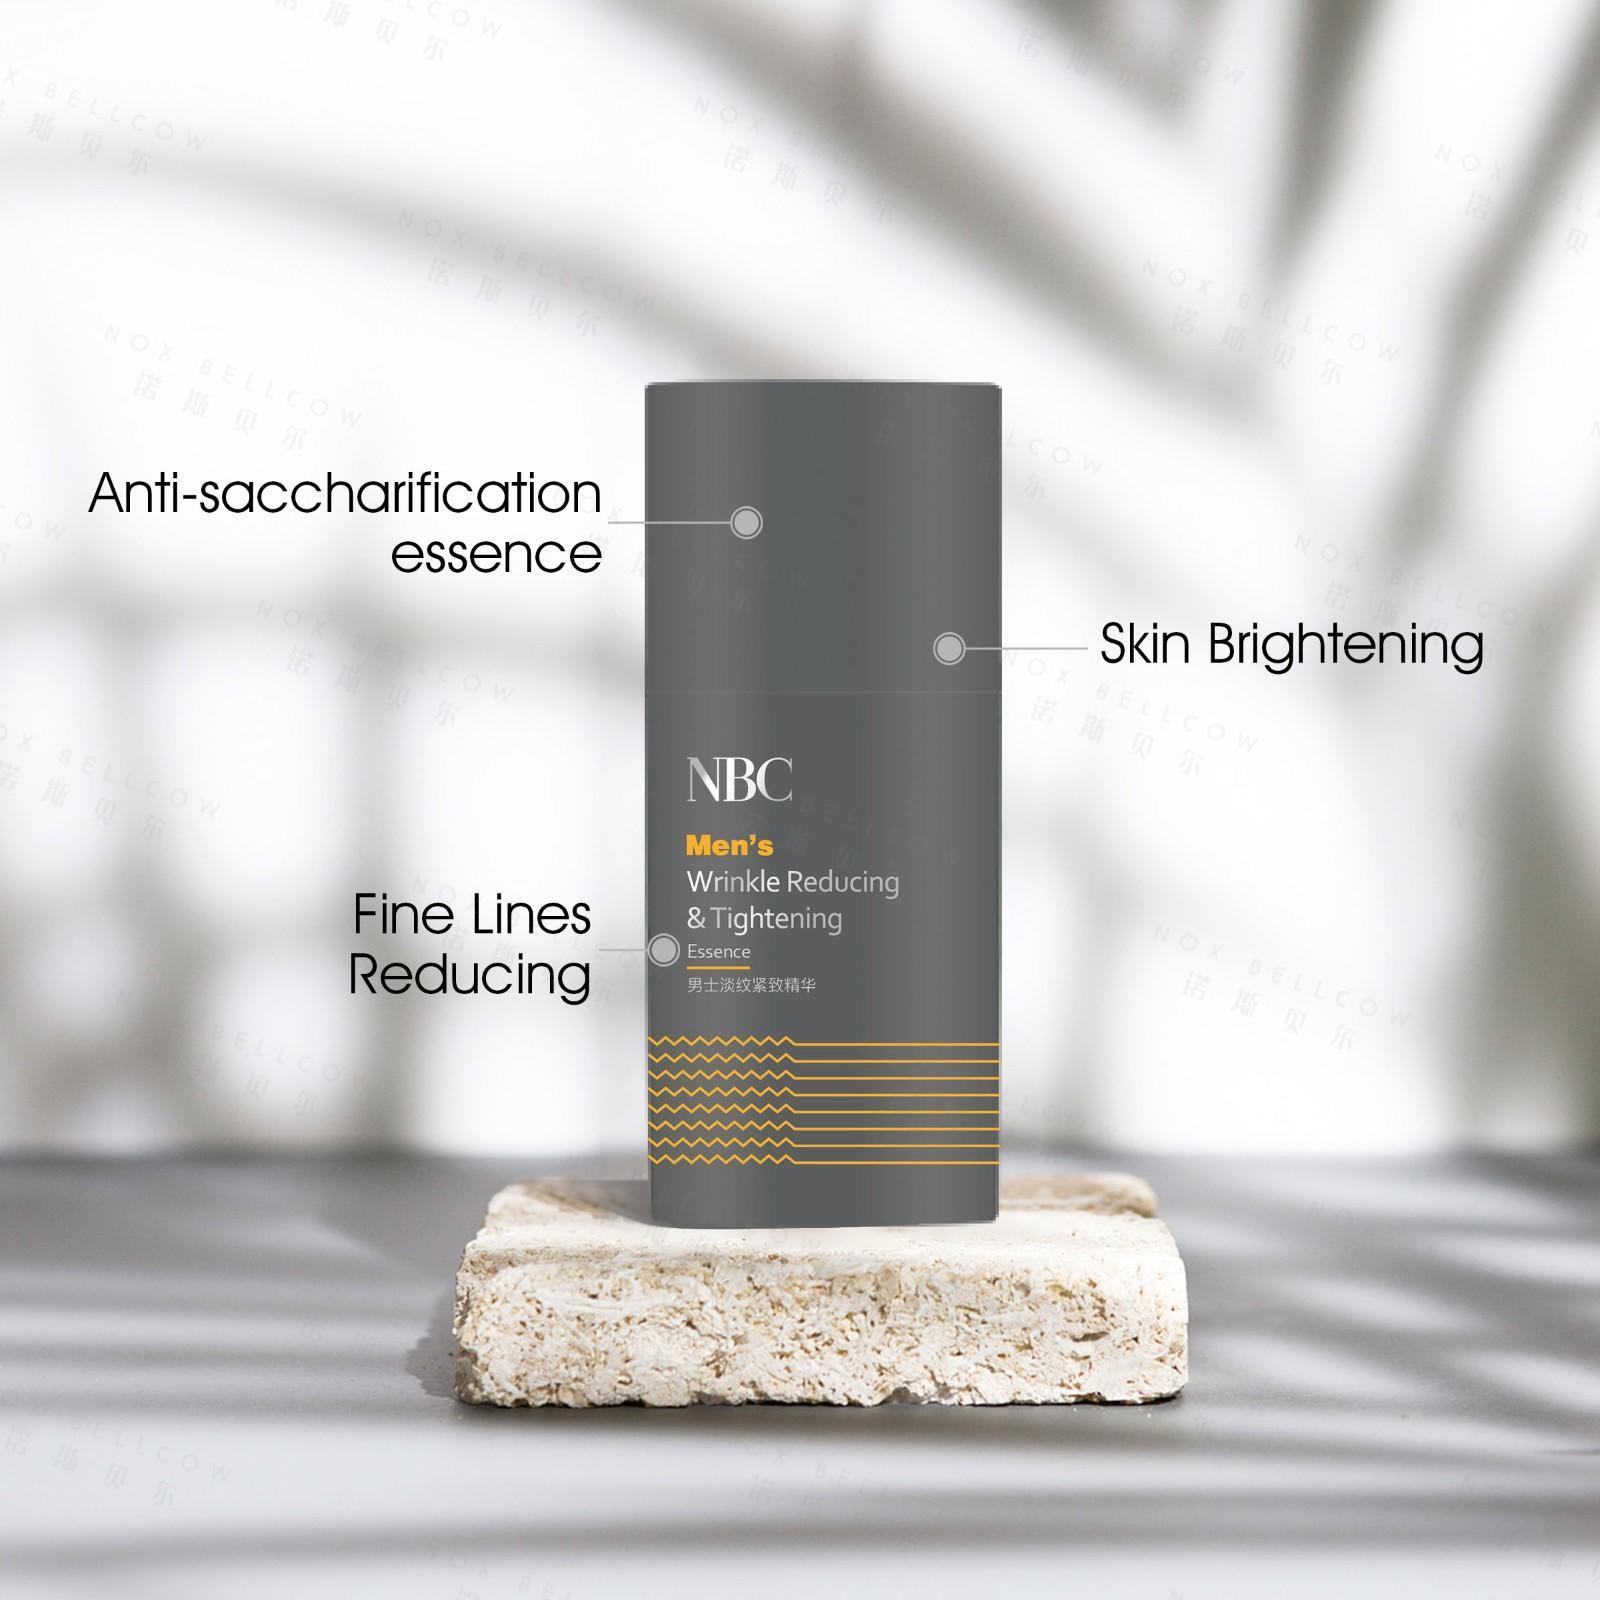 NOX BELLCOW Best Men's skin care company for women-3